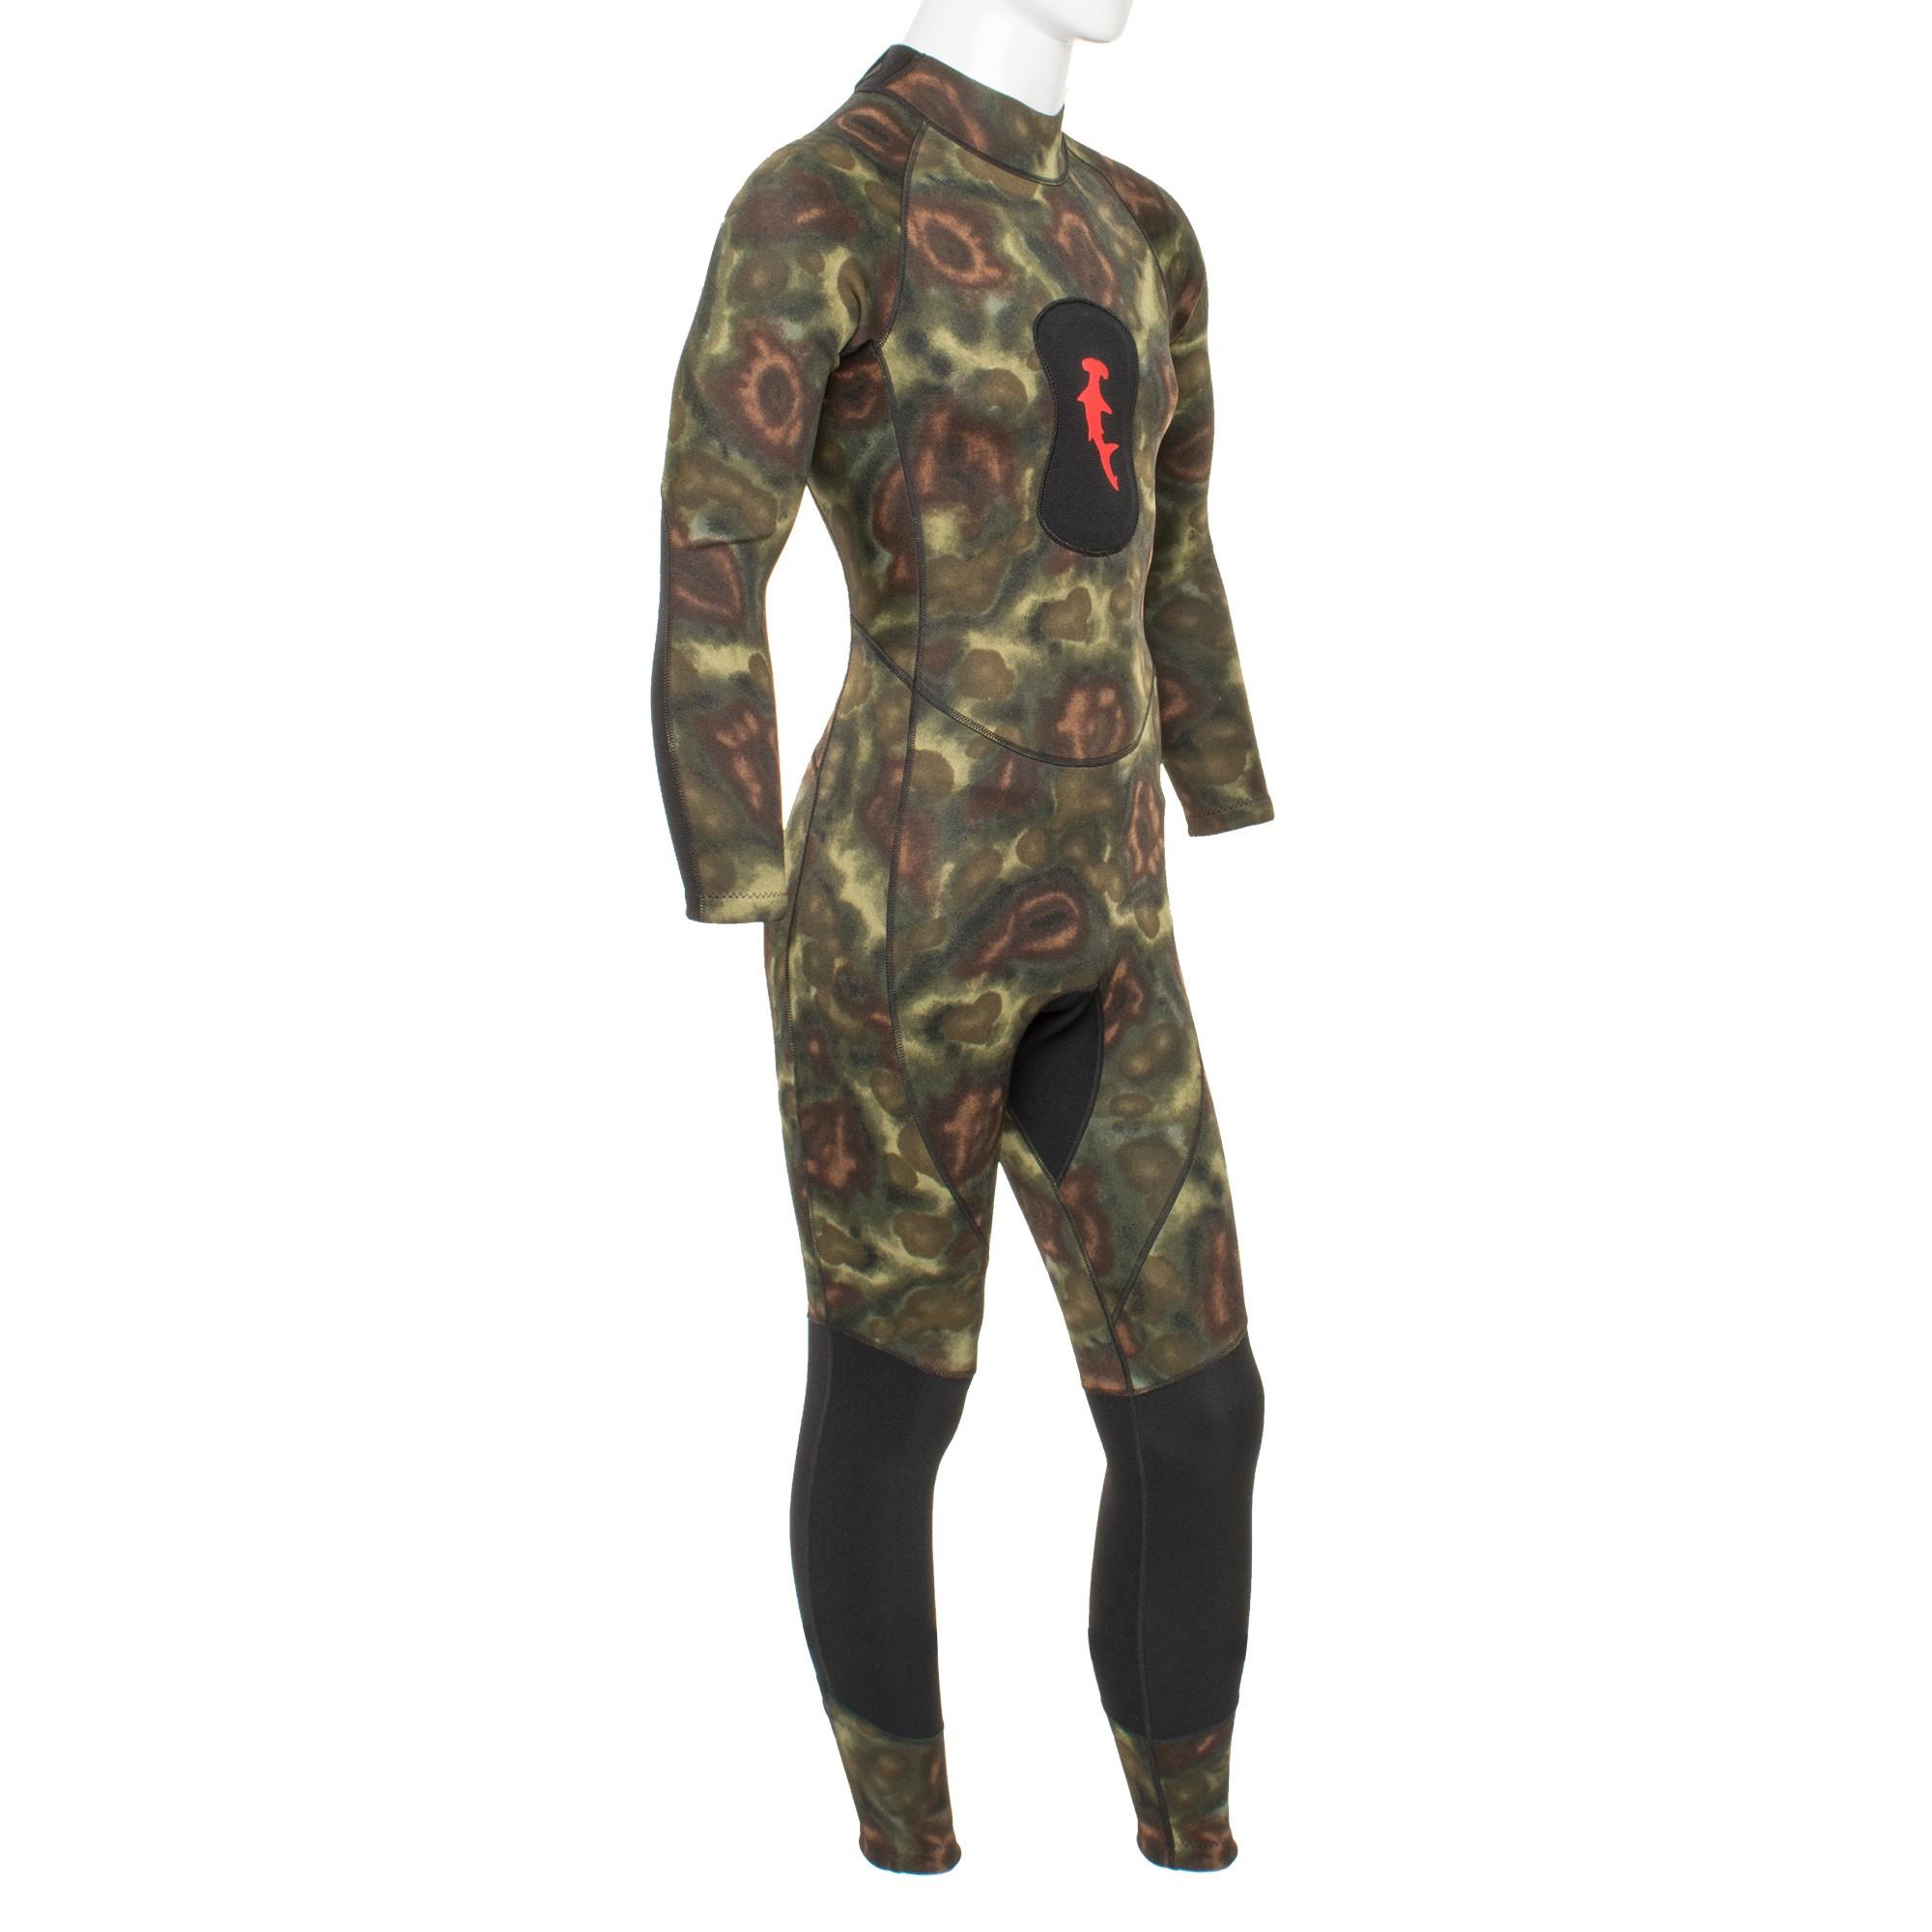 Hammerhead Ambush Wetsuit, 2 mm One-Piece Angle